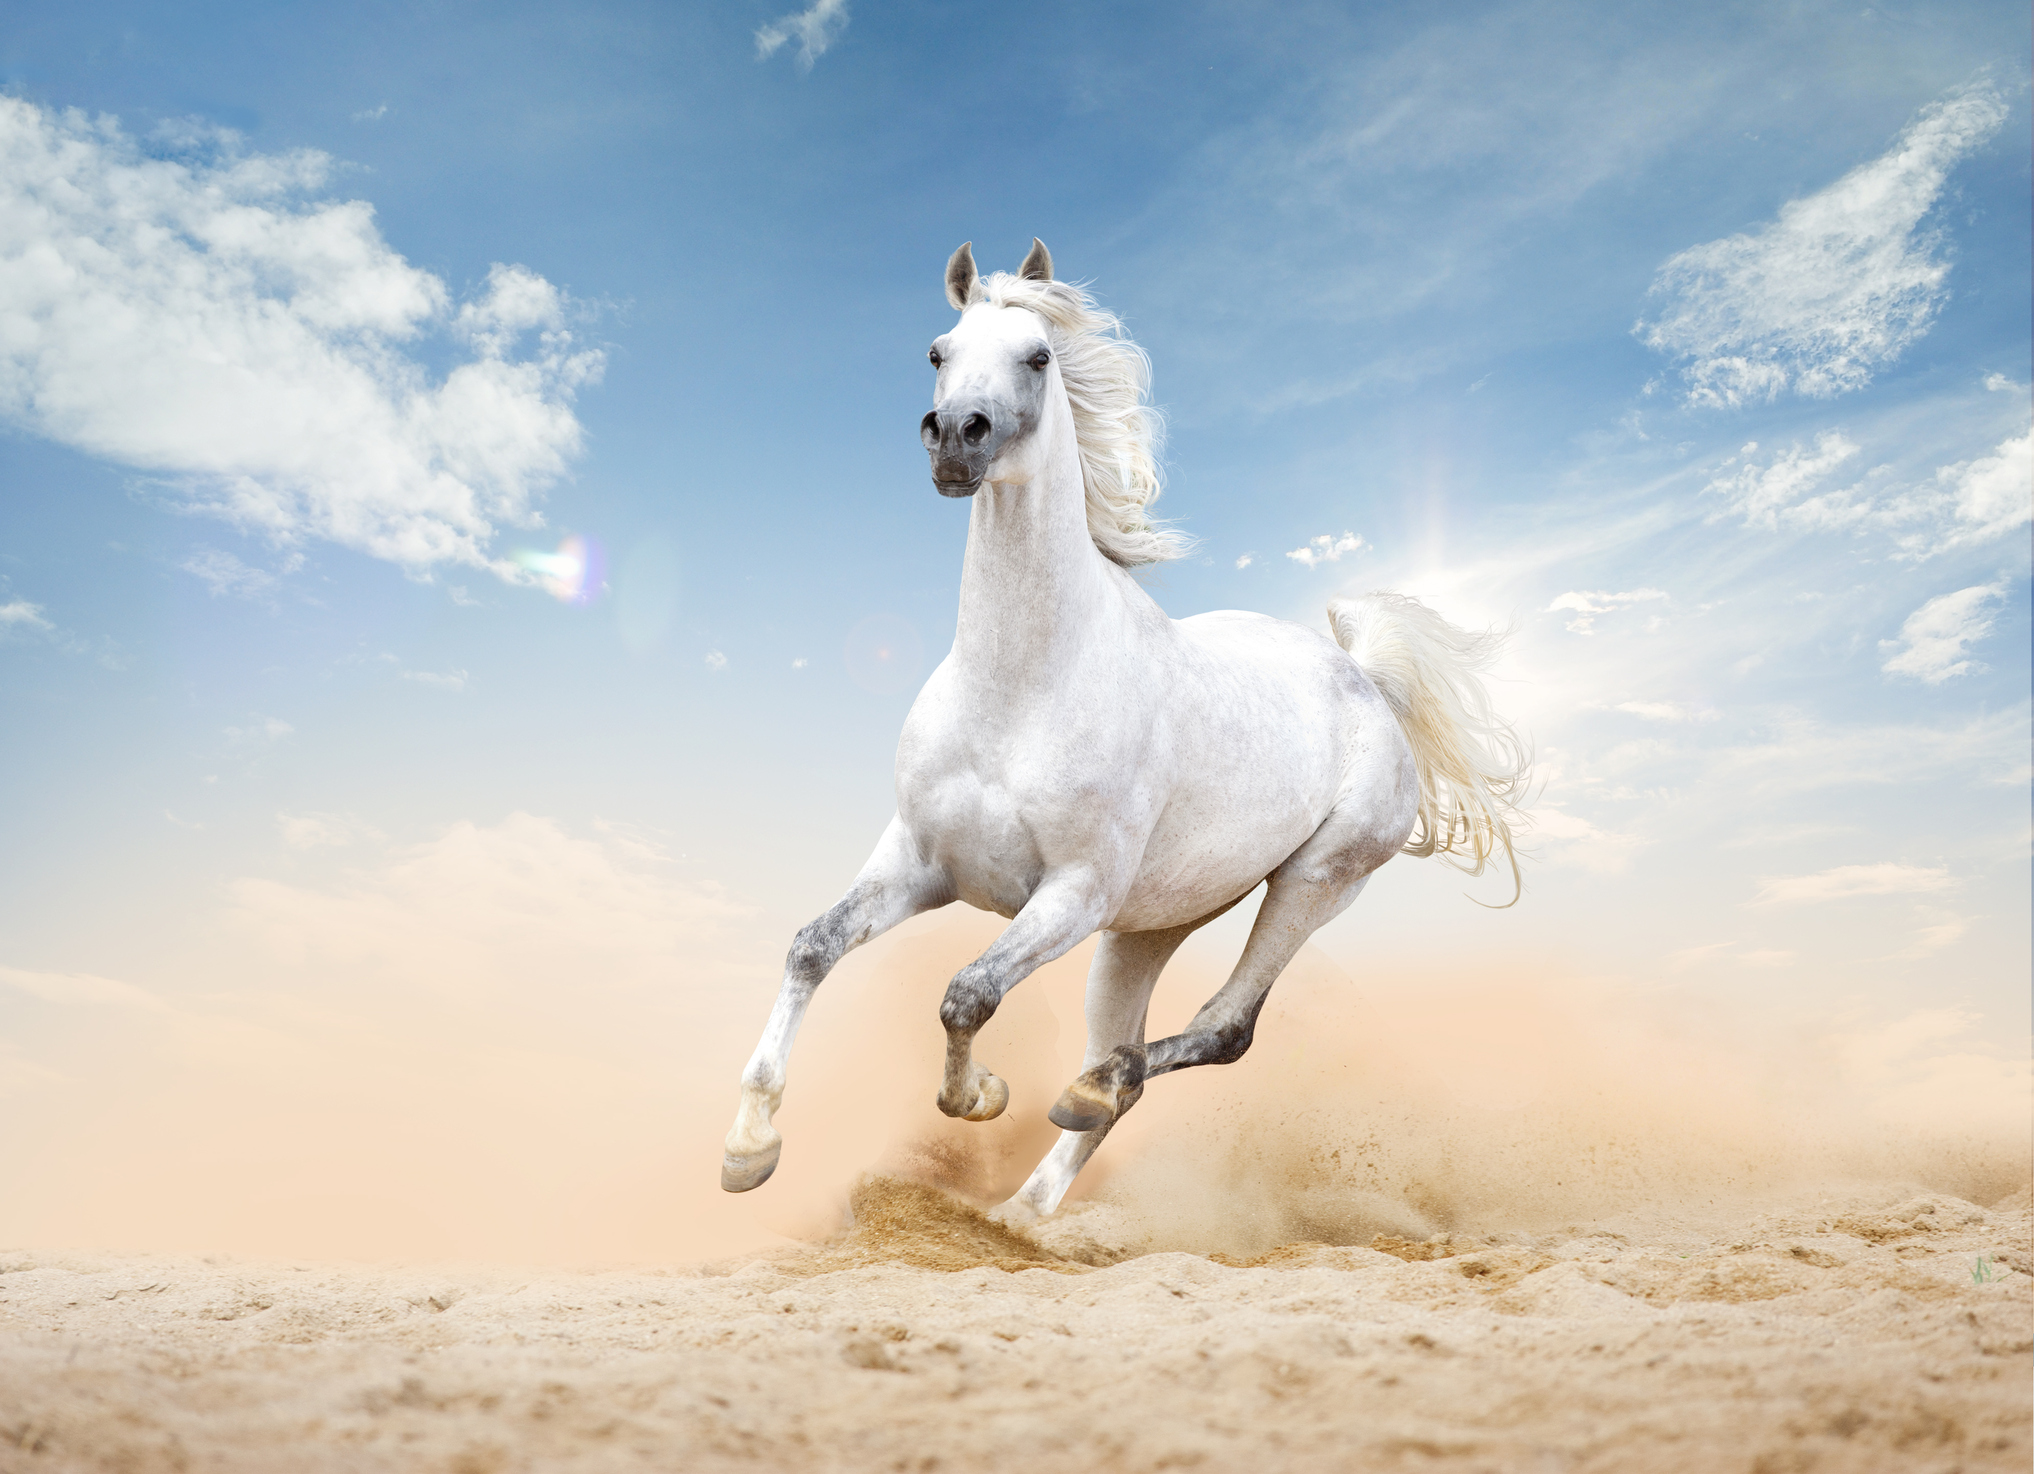 Arabian Horse Runs Free In Desert